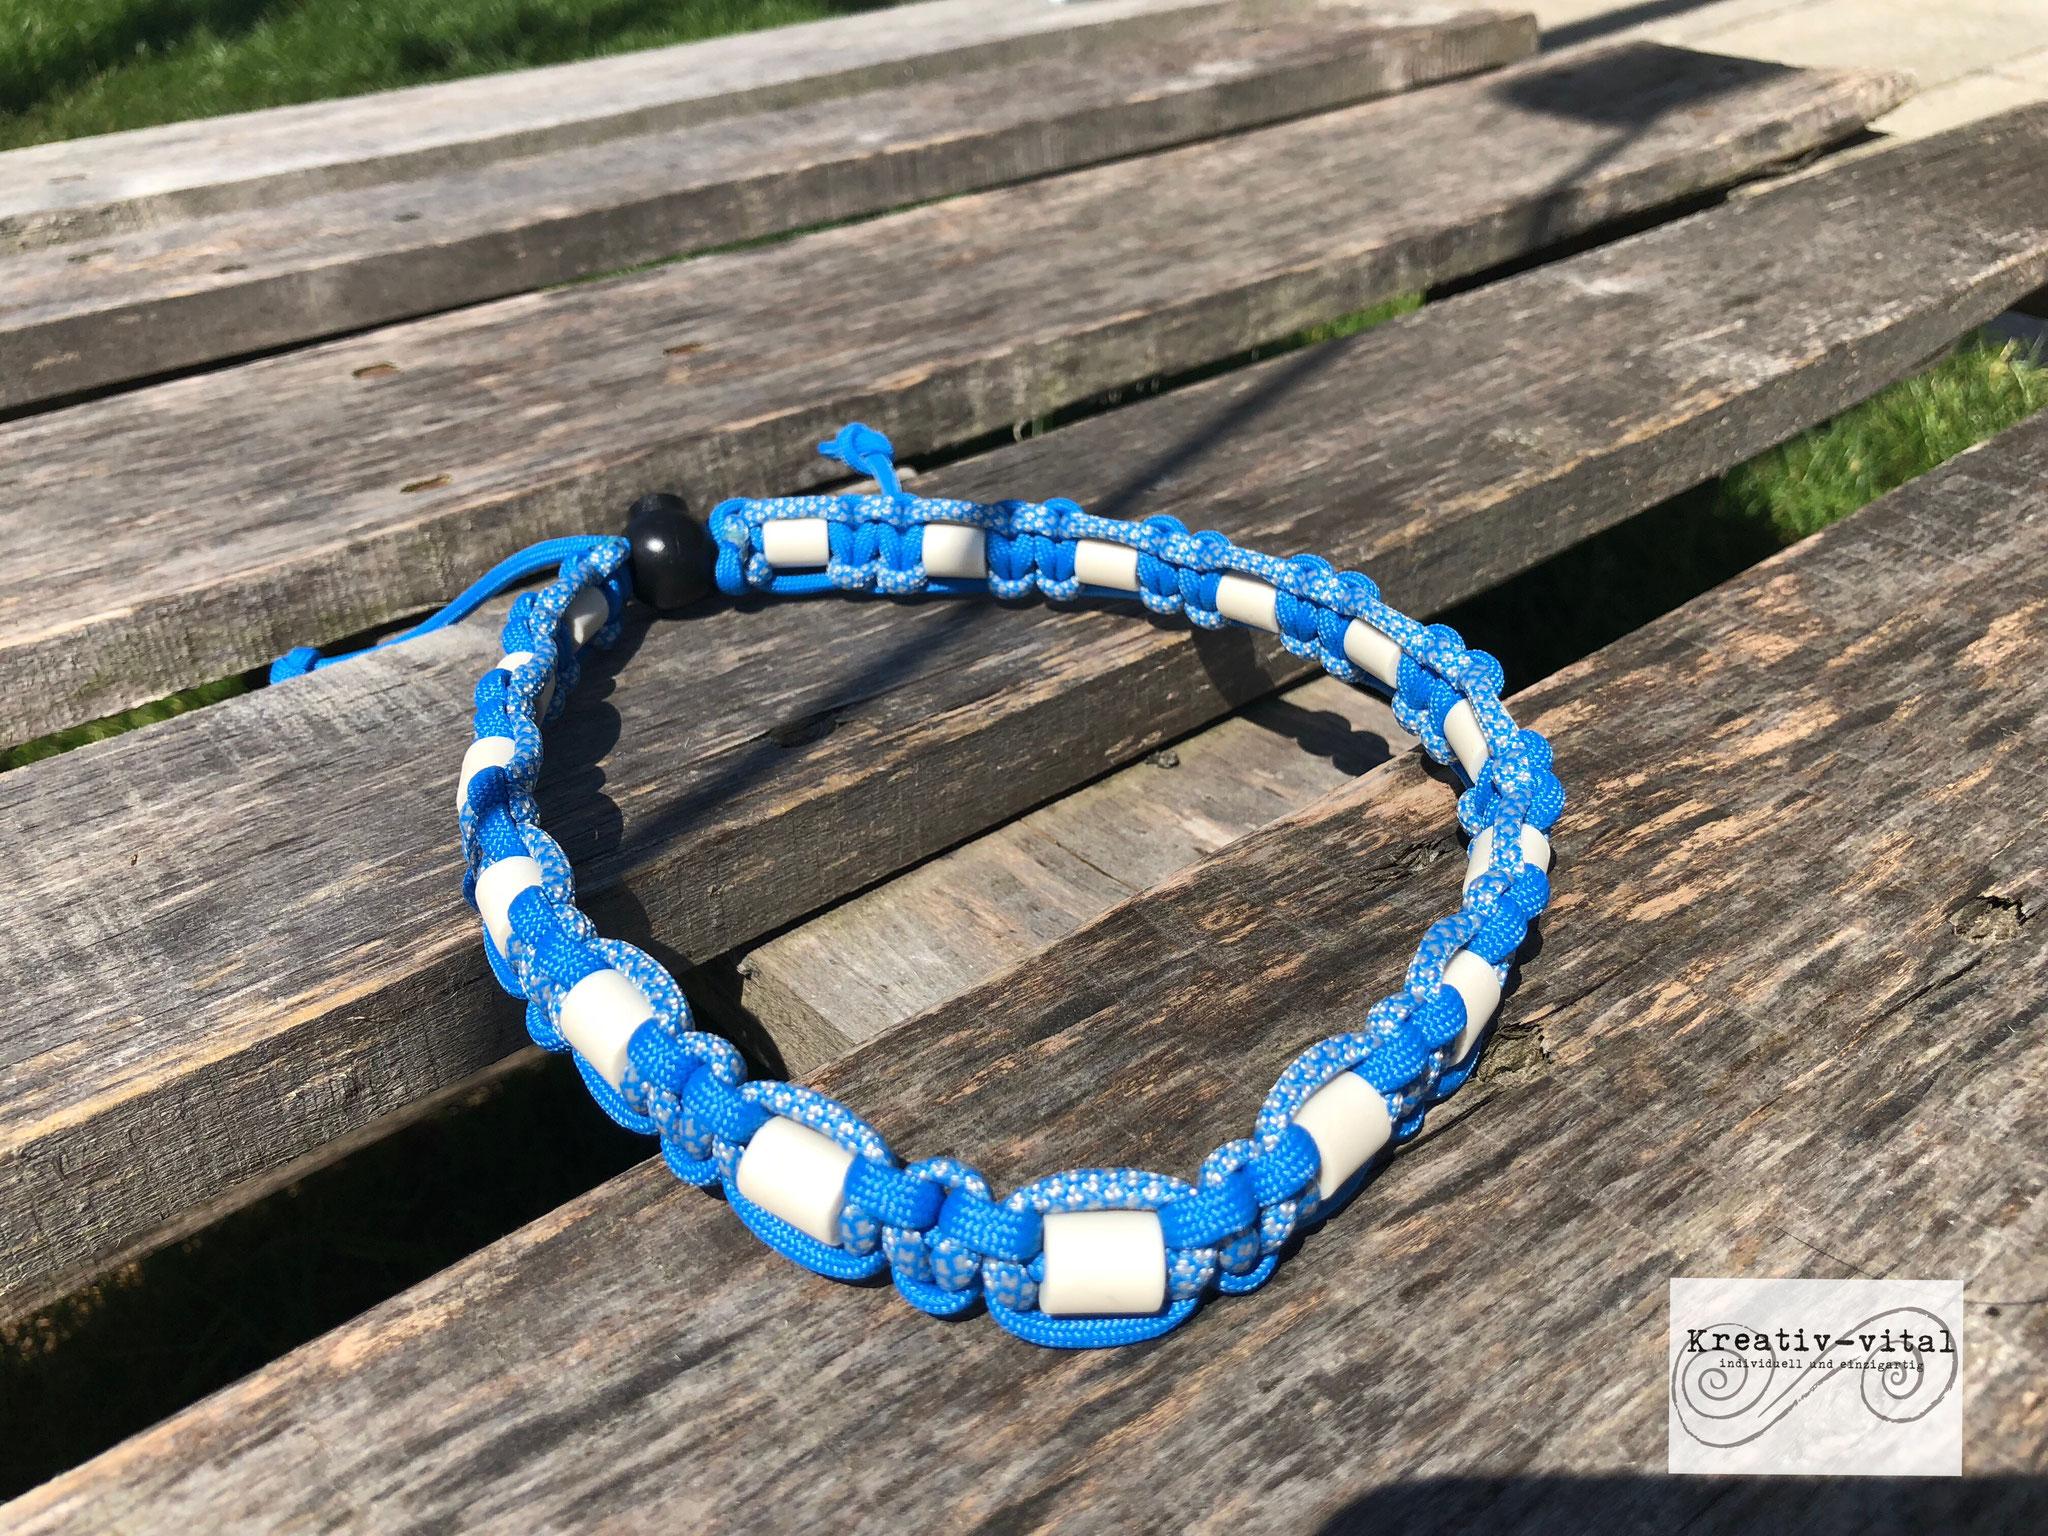 EM Keramik Halsband für Hund/Katze 46-50cm Halsumfang blue/colonial blue